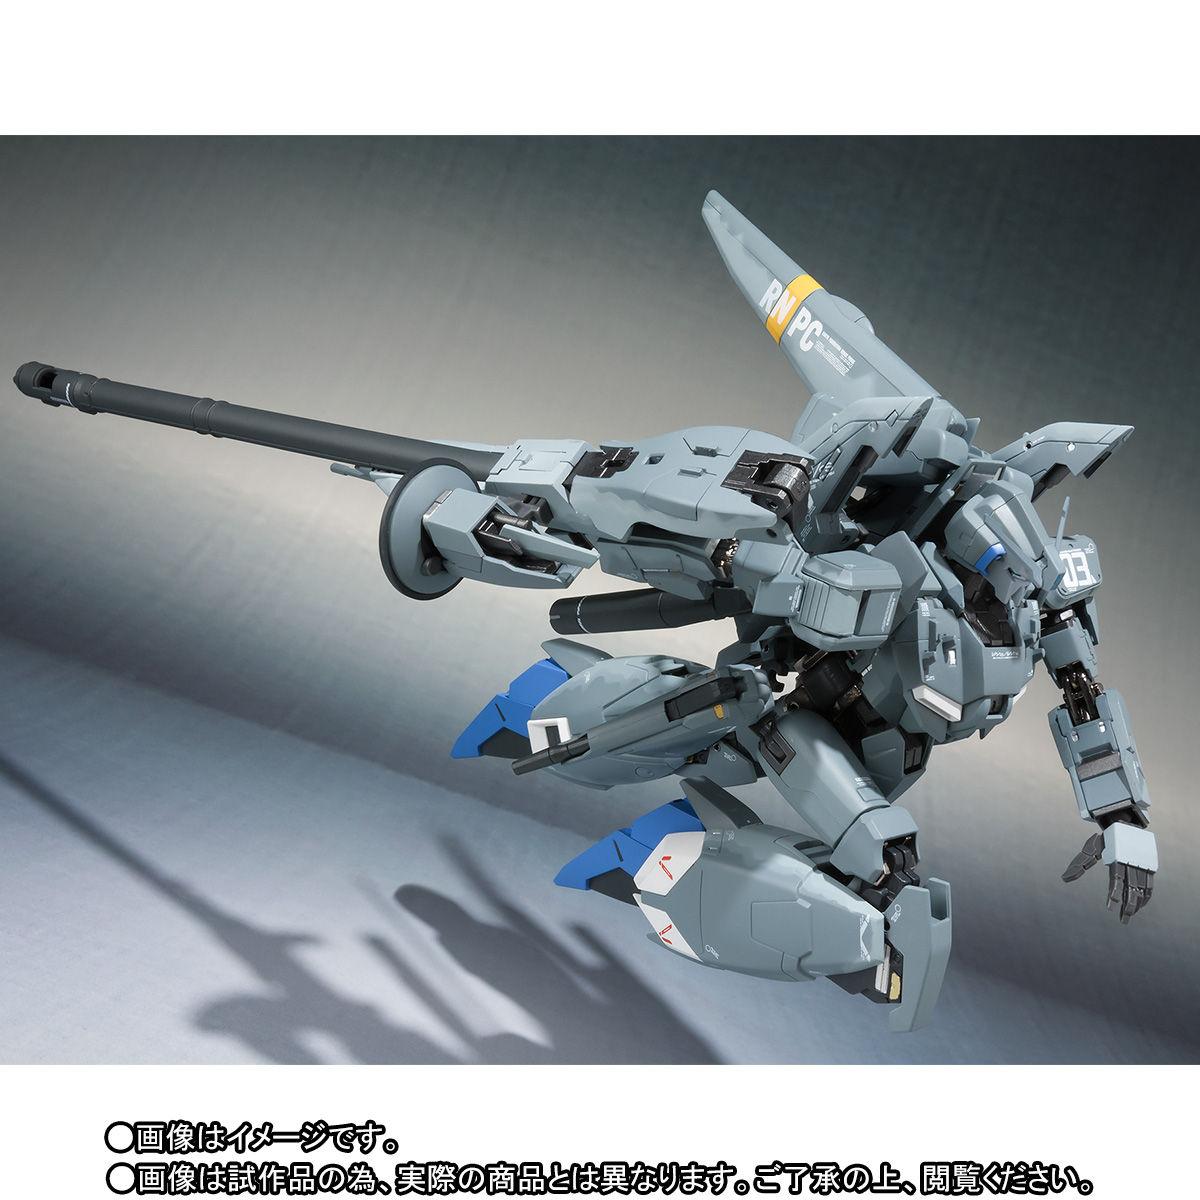 METAL ROBOT魂(Ka signature)<SIDE MS>『ゼータプラス C1(03 シグマン機)』可動フィギュア-003